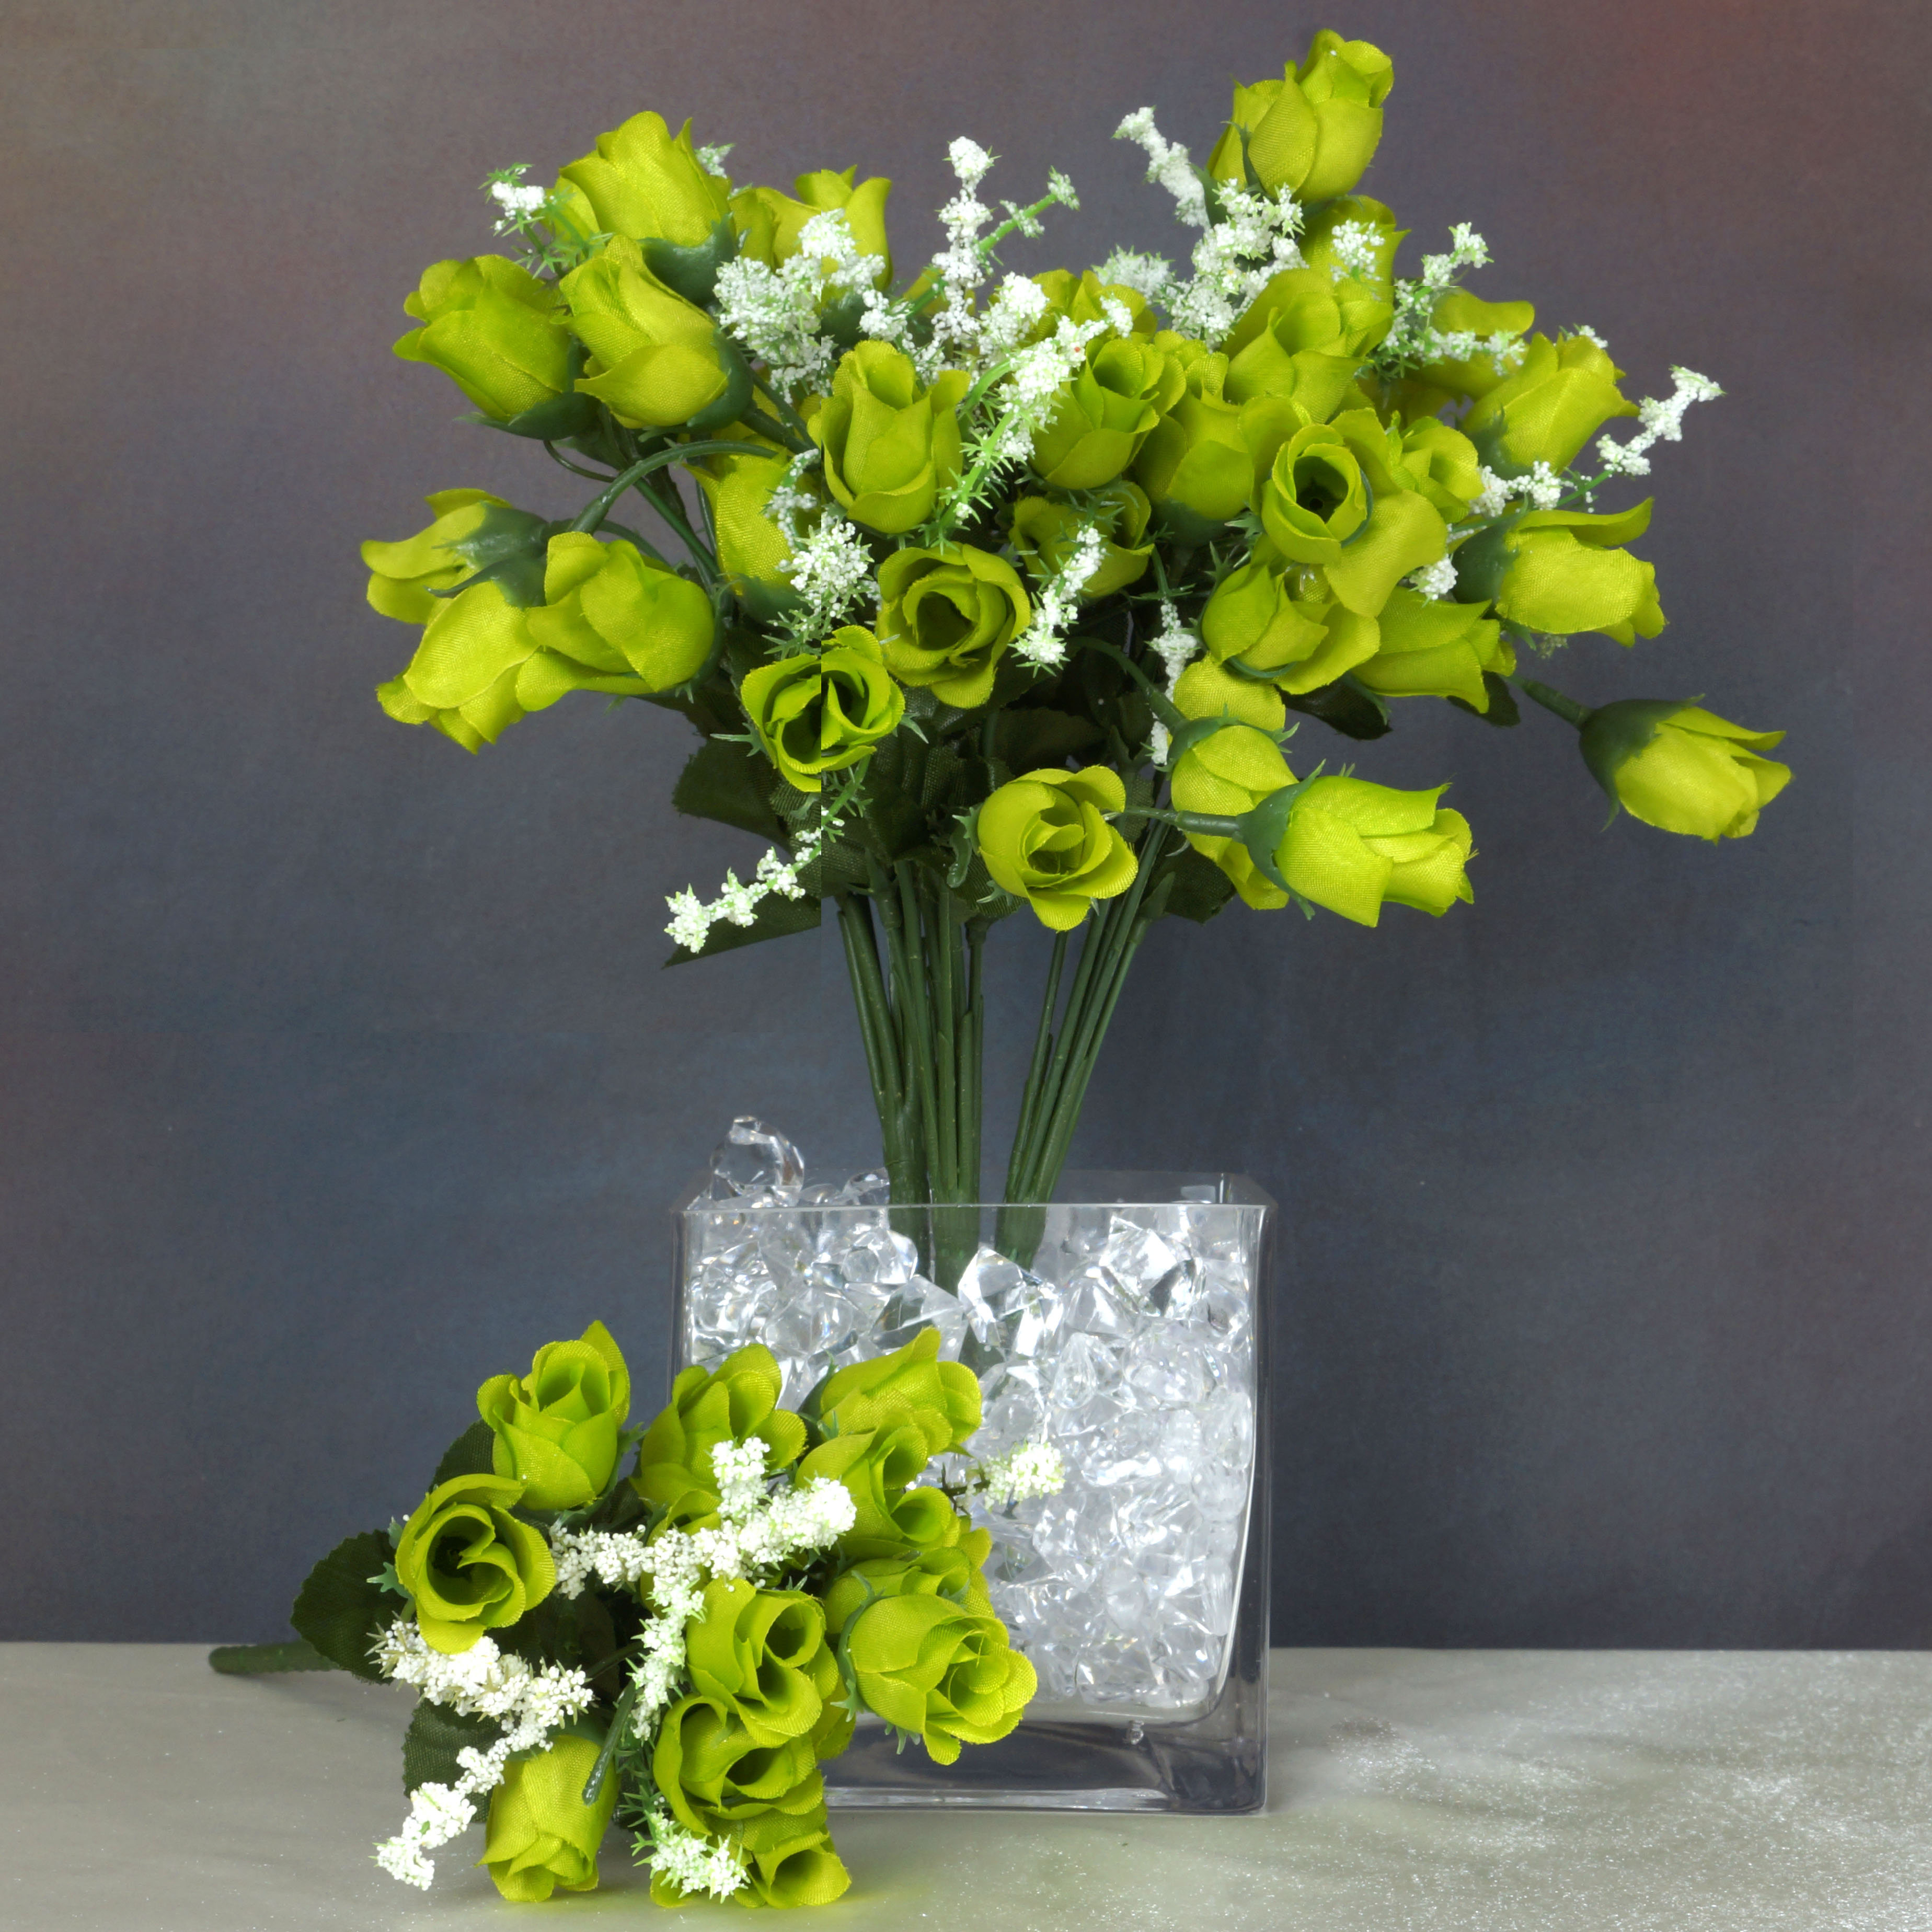 BalsaCircle 180 Mini Silk Roses Buds Flowers - 12 Bushes - DIY Home Wedding Party Artificial Bouquets Arrangements Centerpieces